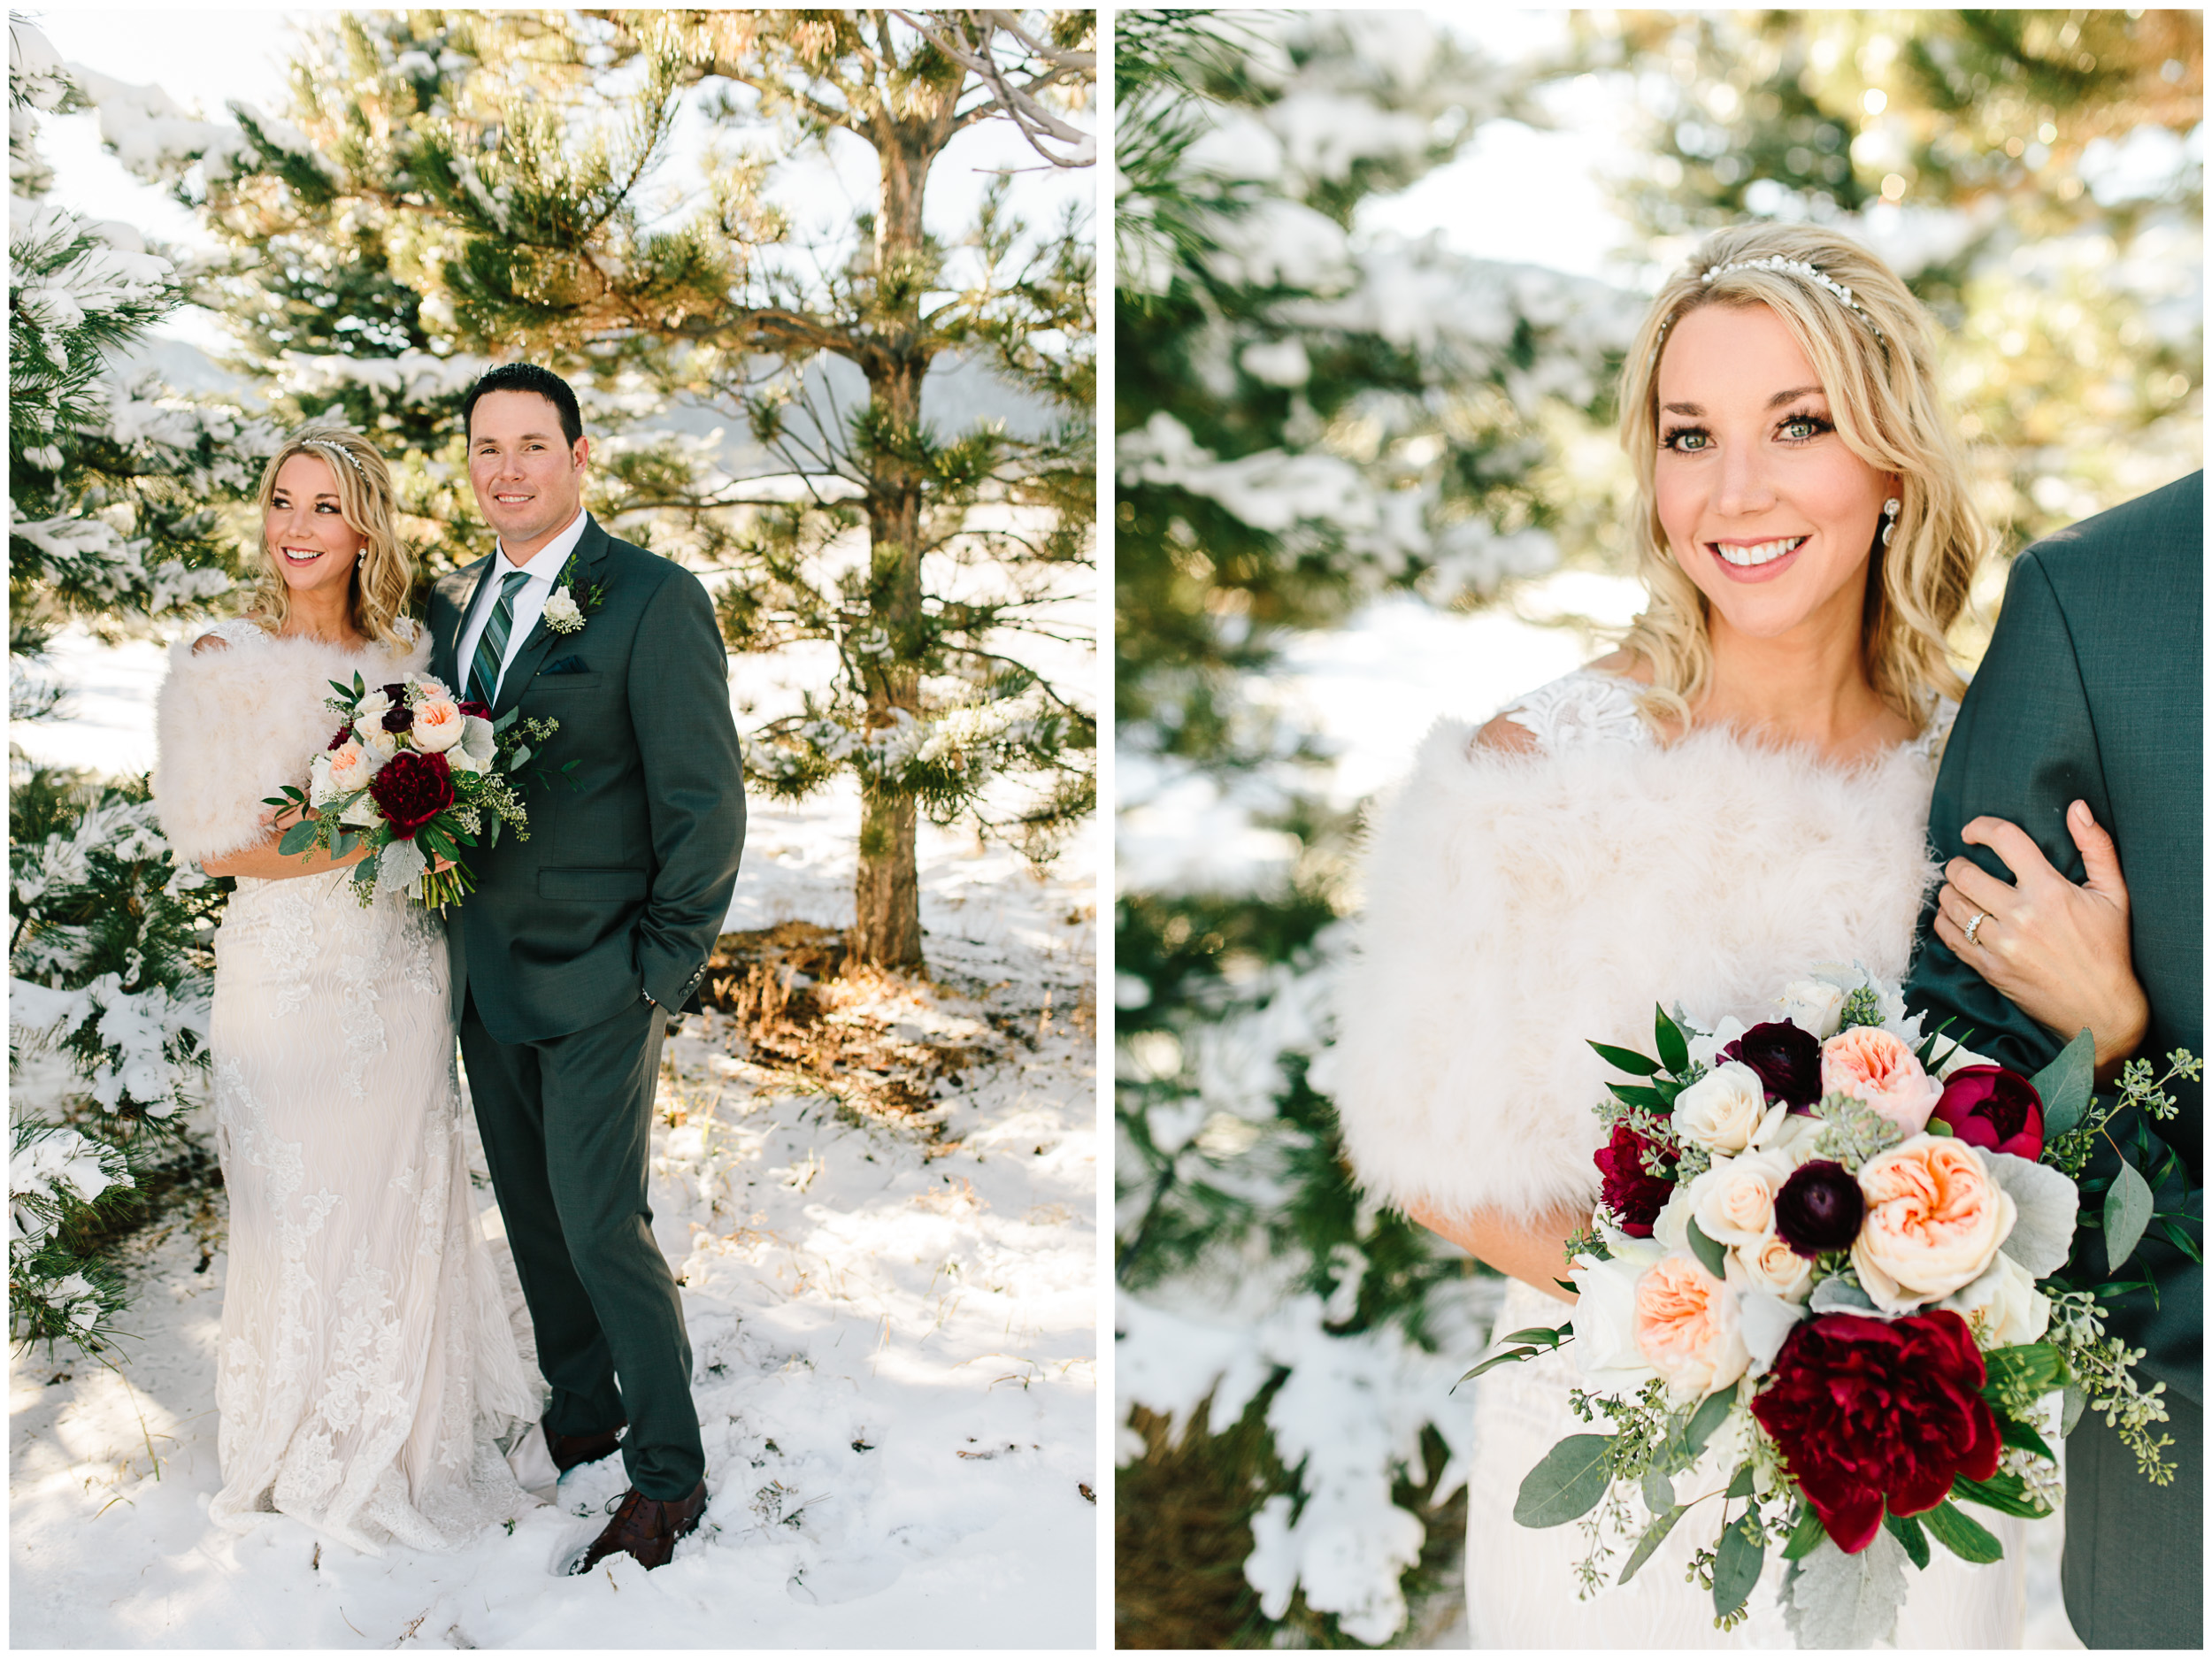 spruce_mountain_ranch_wedding_26.jpg